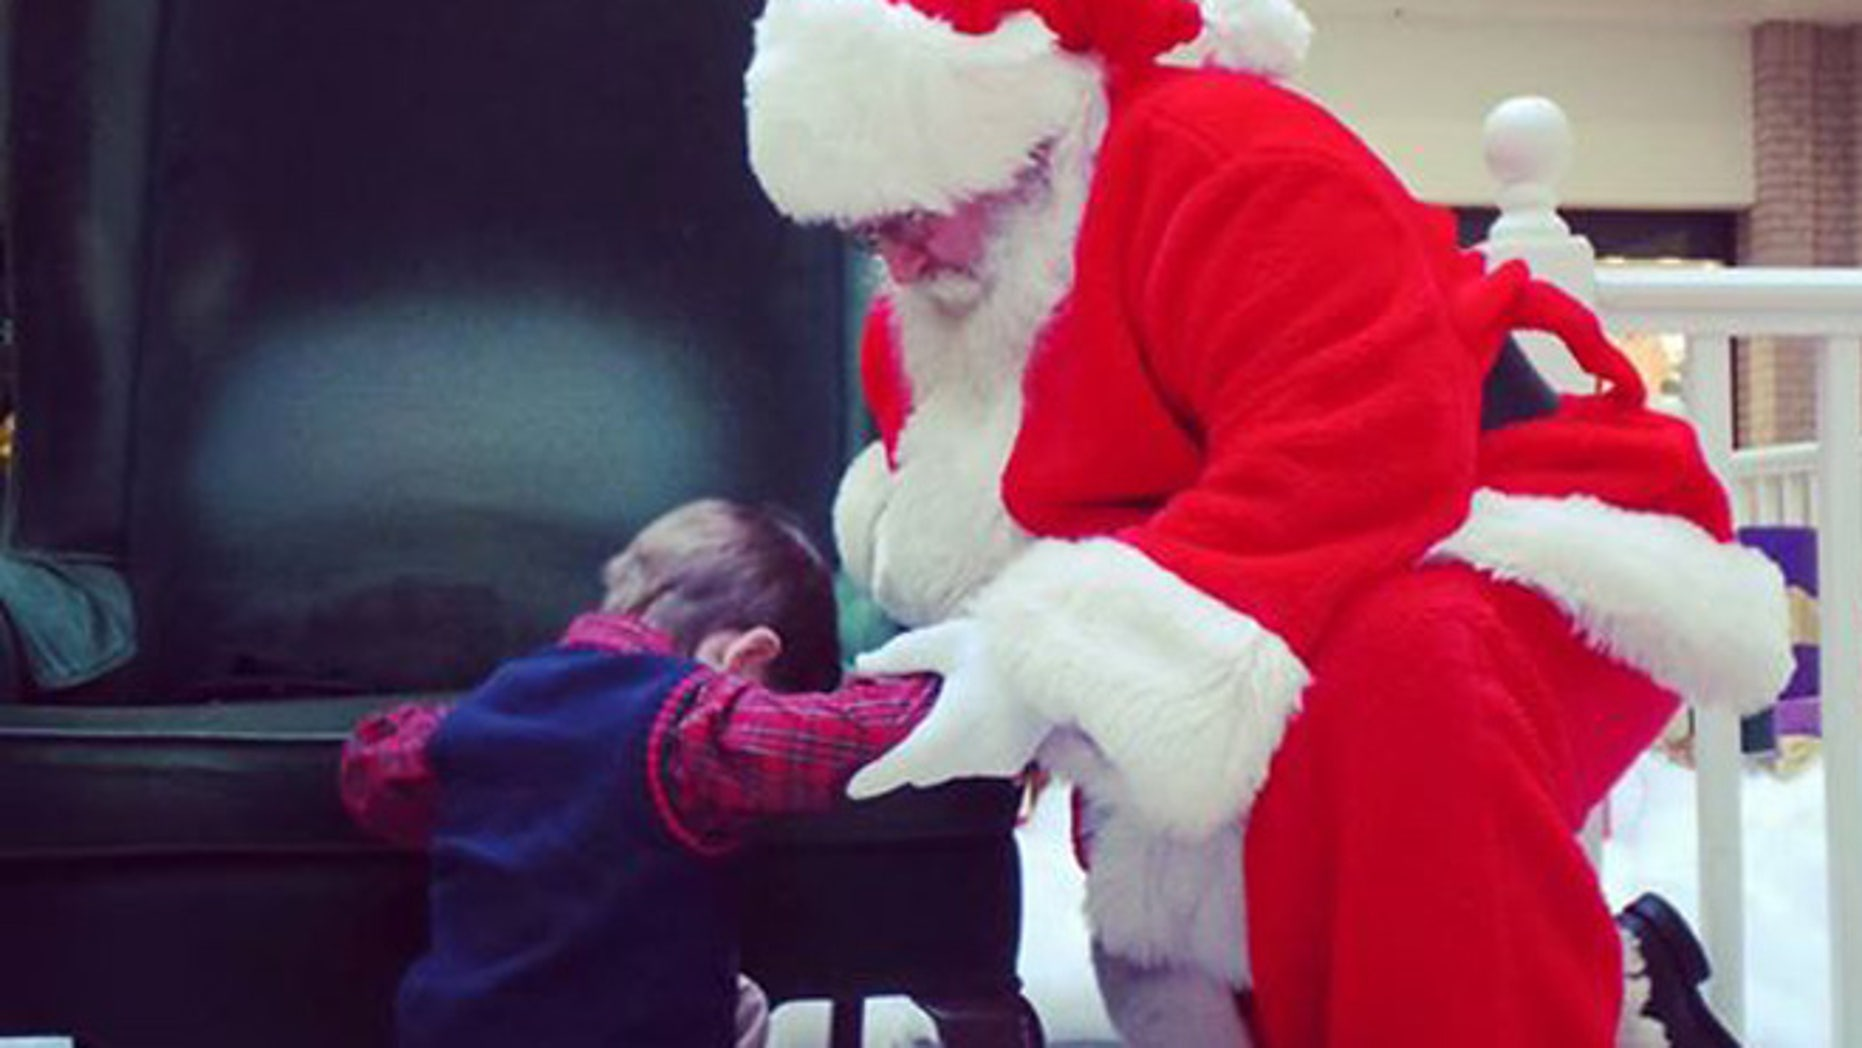 Prestyn Barnette, 4, prays for Baby Knox with Santa at South Carolina mall (Rebekah Lauren Sharpe)